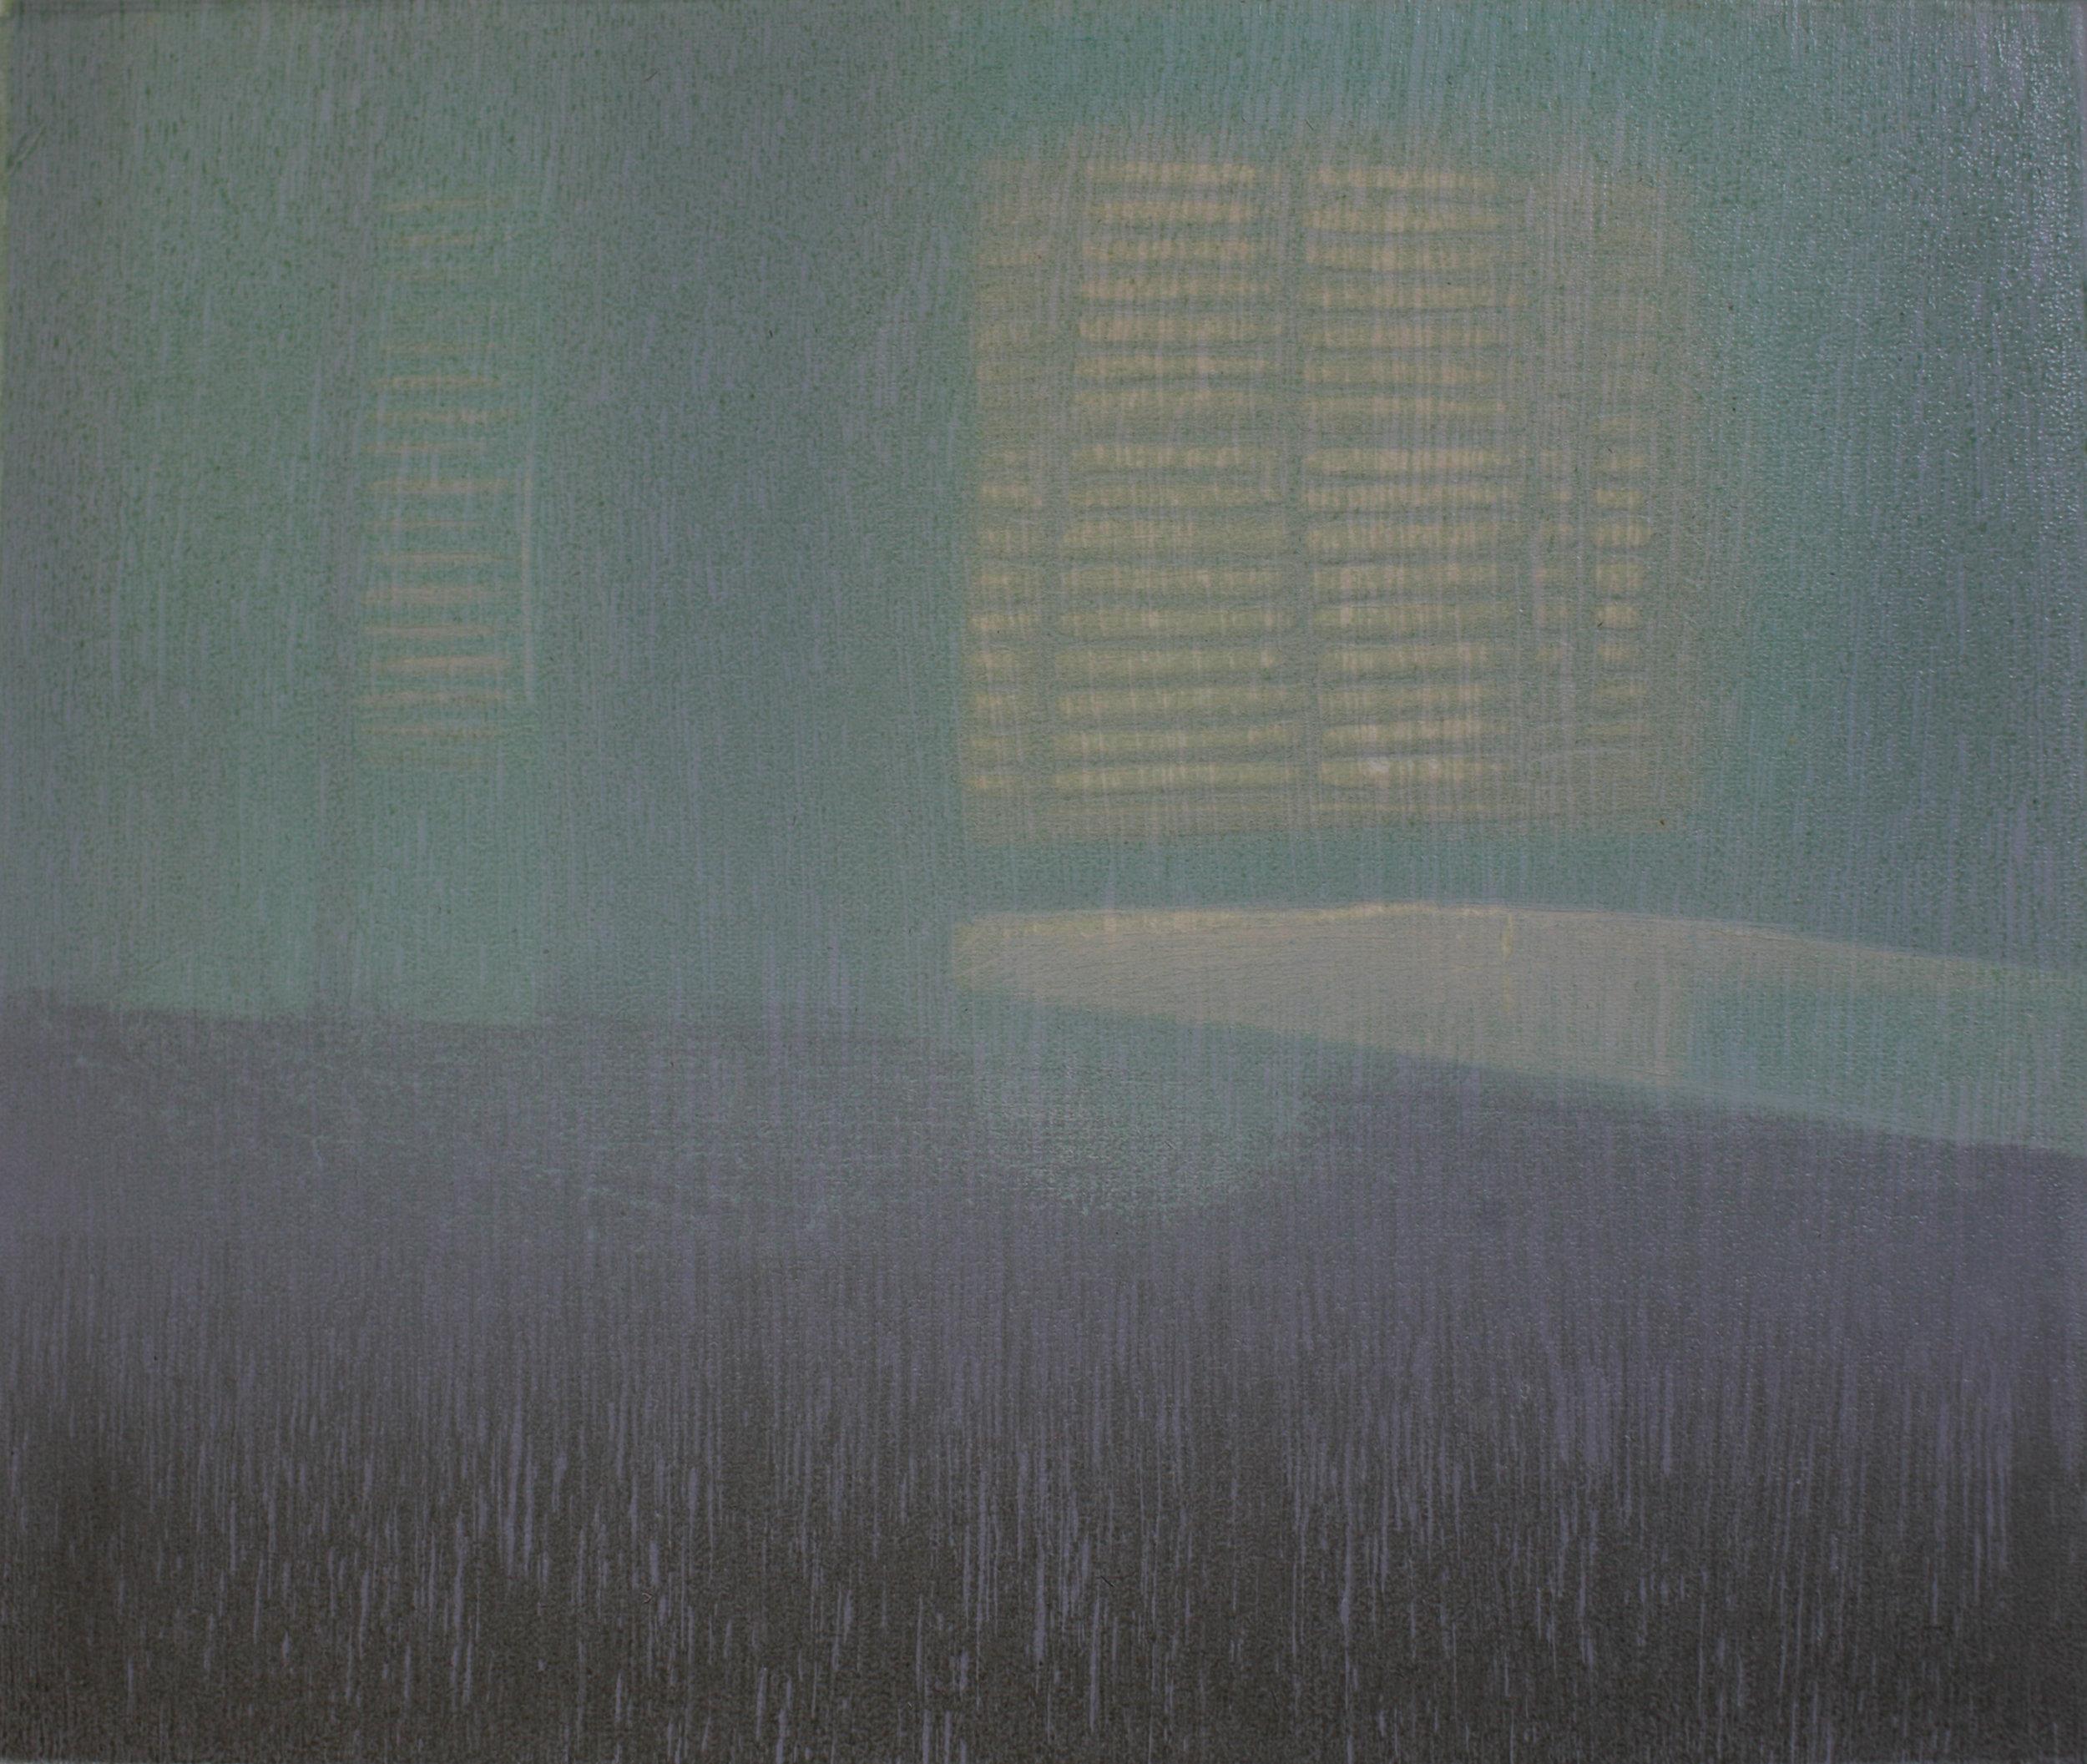 Praween PIANGCHOOMPU, Serenity #2,2018, Woodcut on Paper, 8 of 8, 17 x 21 cm